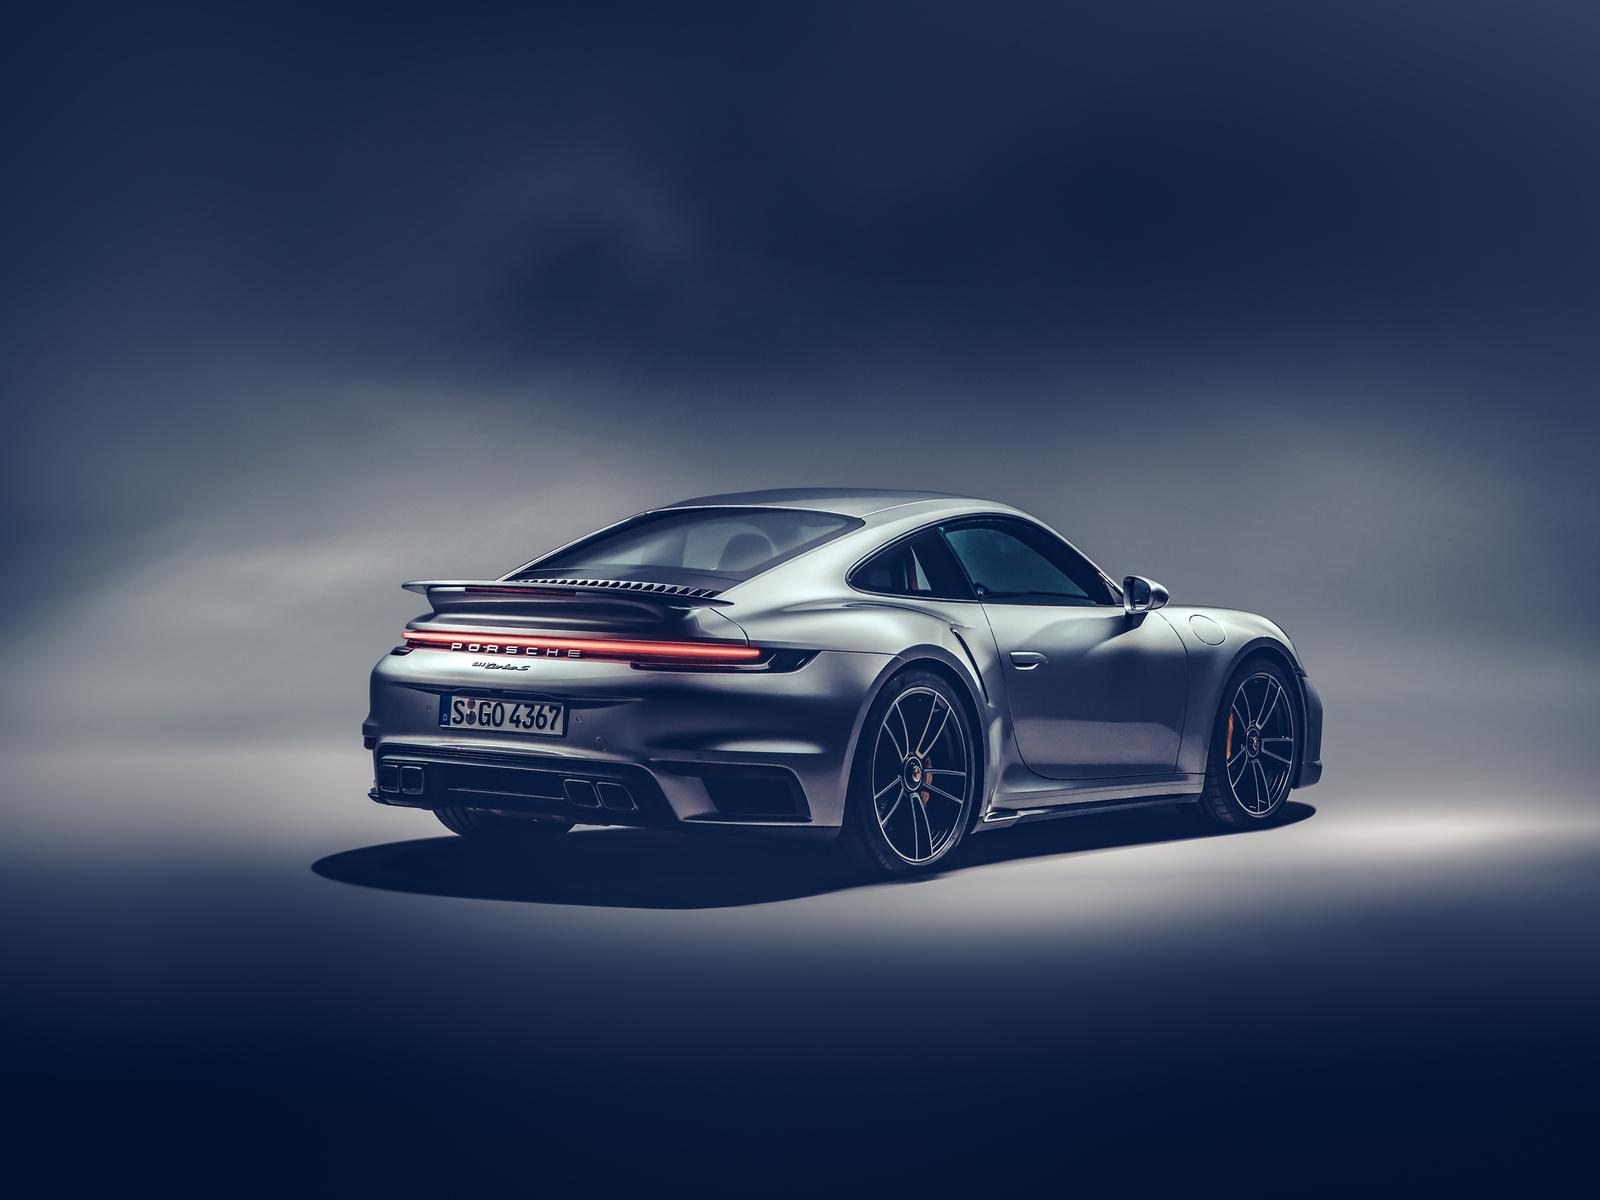 2021-porsche-911-turbo-s-rear-view-u8.jpg